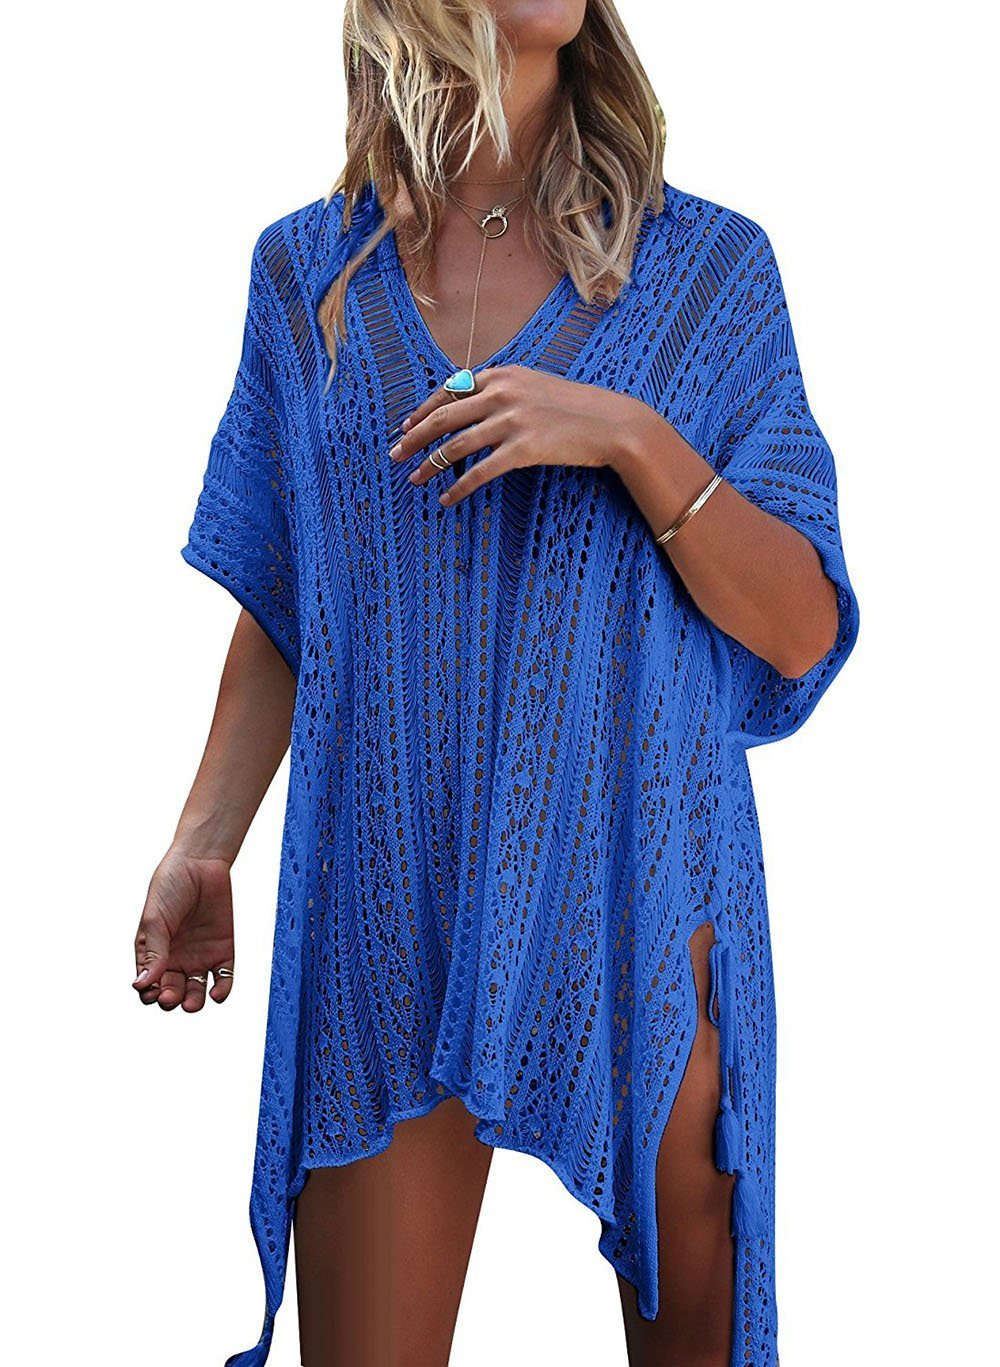 Tuopuda Women's Bathing Suit Cover Up, Bohemian Style V-Neck Beach Bikini Swimsuit Swimwear Crochet Dress One Size (Blue)